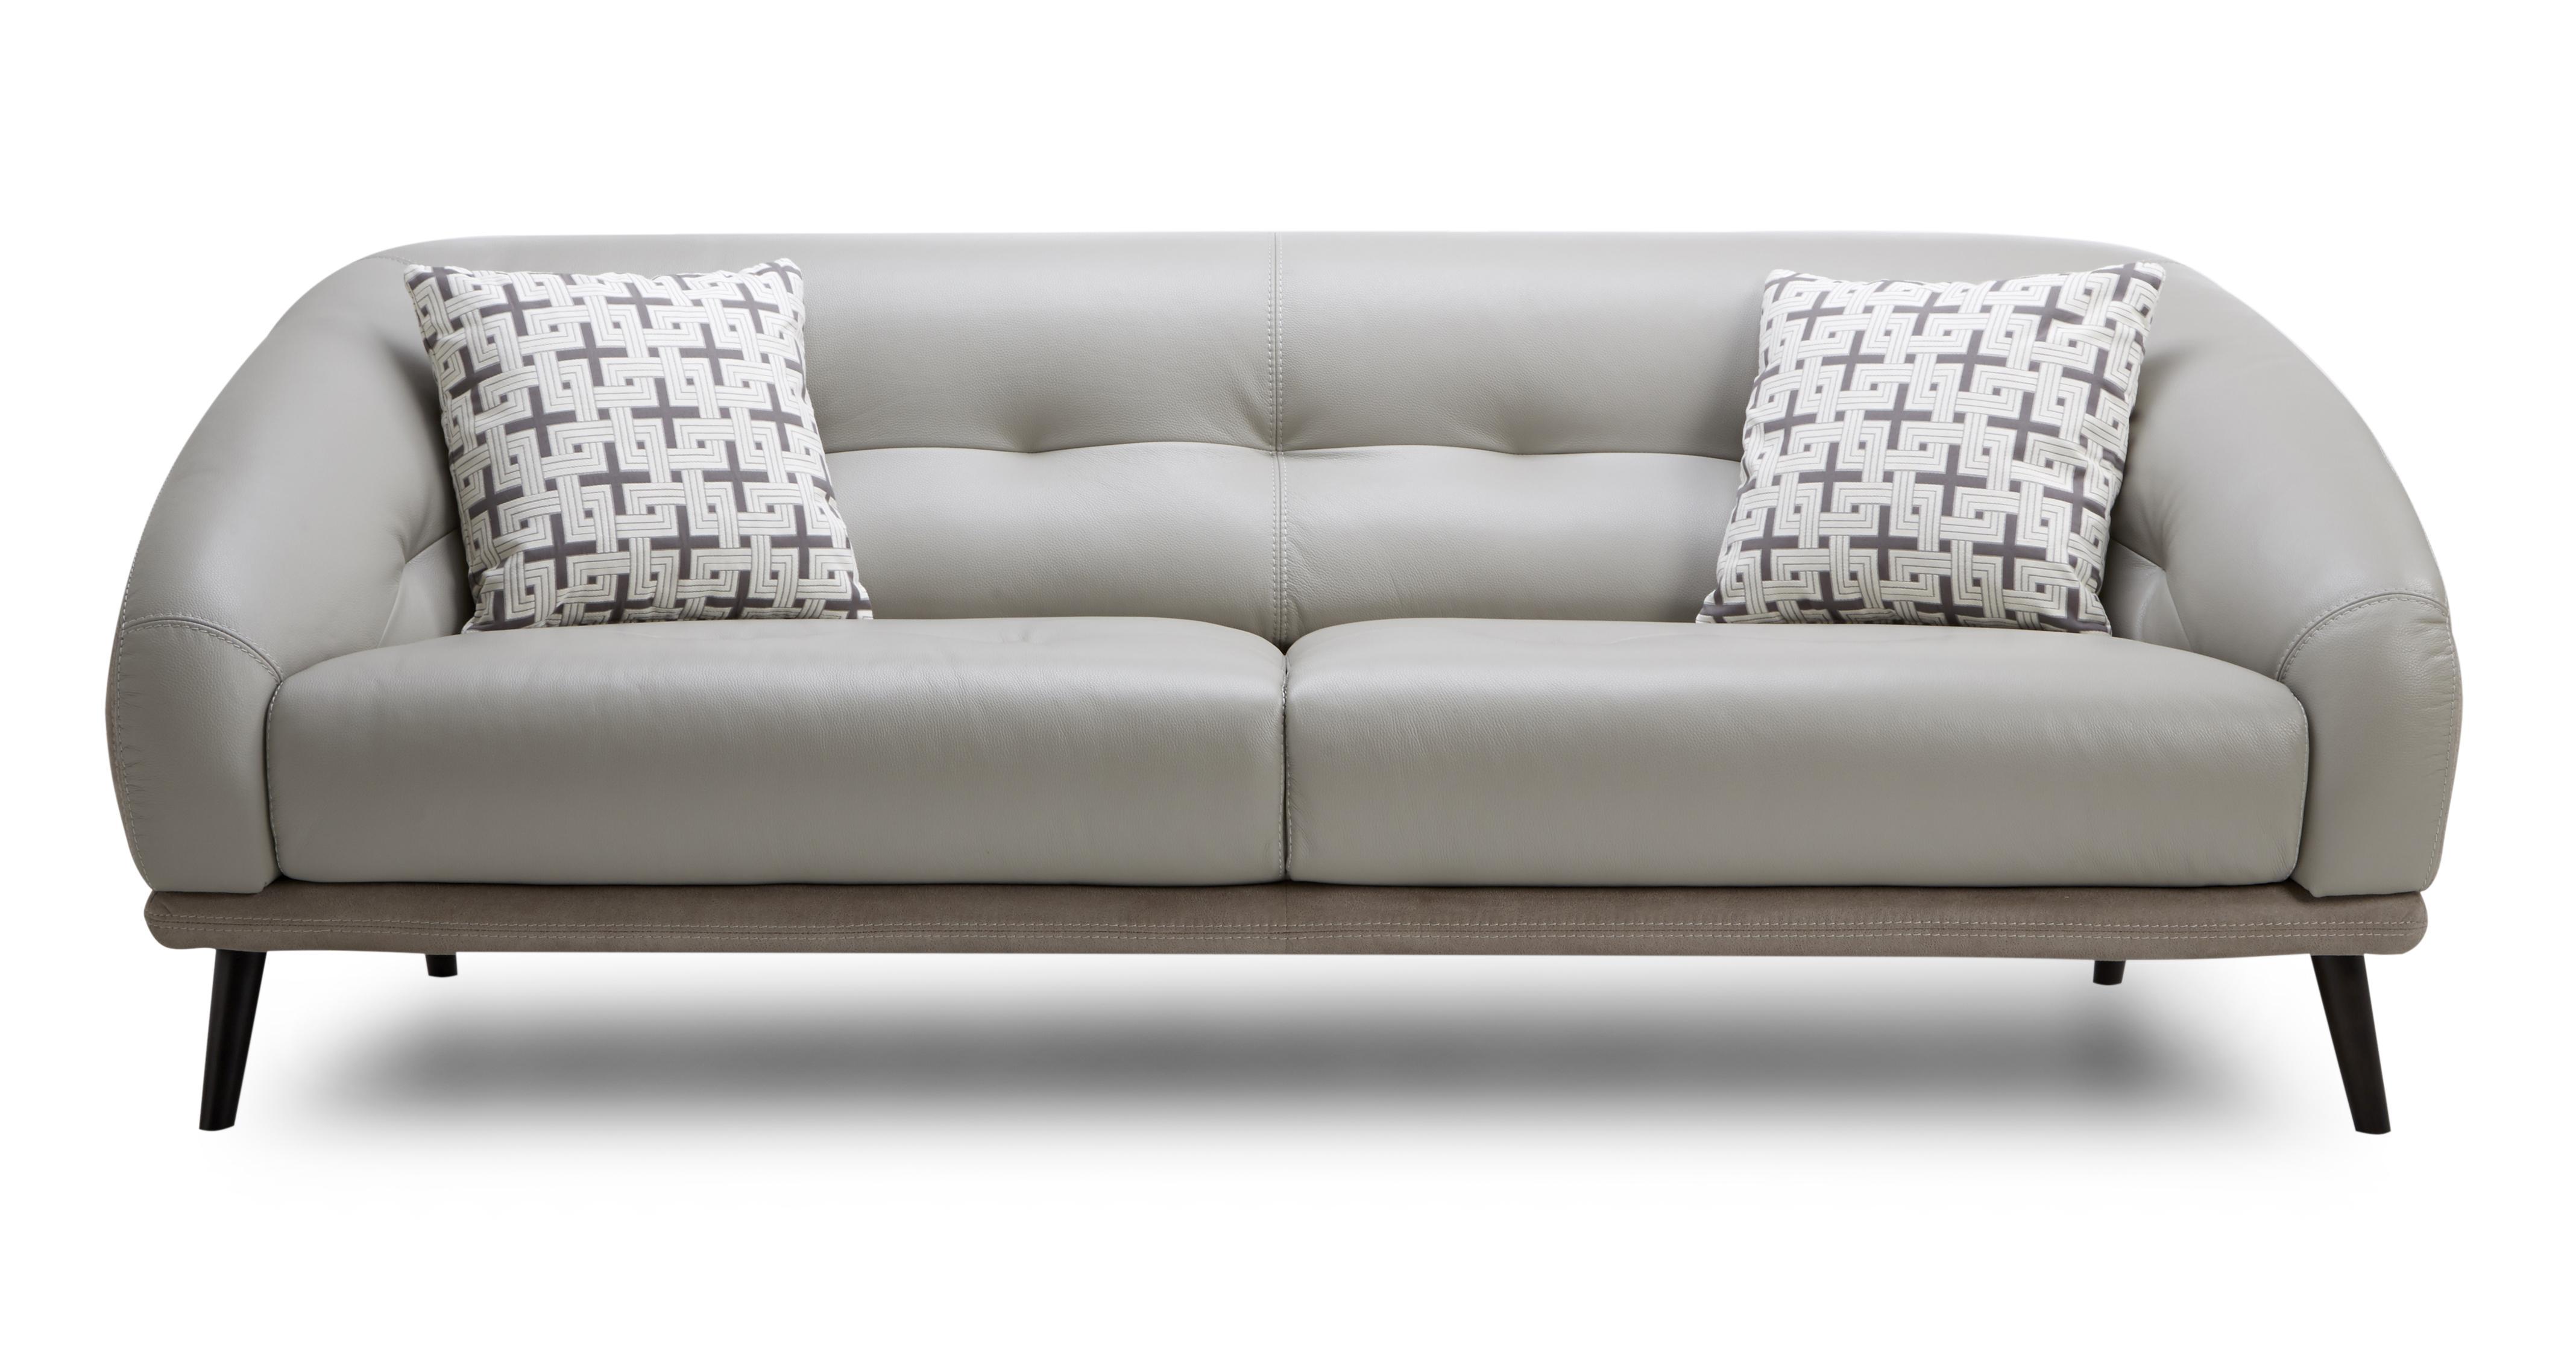 dfs sofas reviews 2017. Black Bedroom Furniture Sets. Home Design Ideas